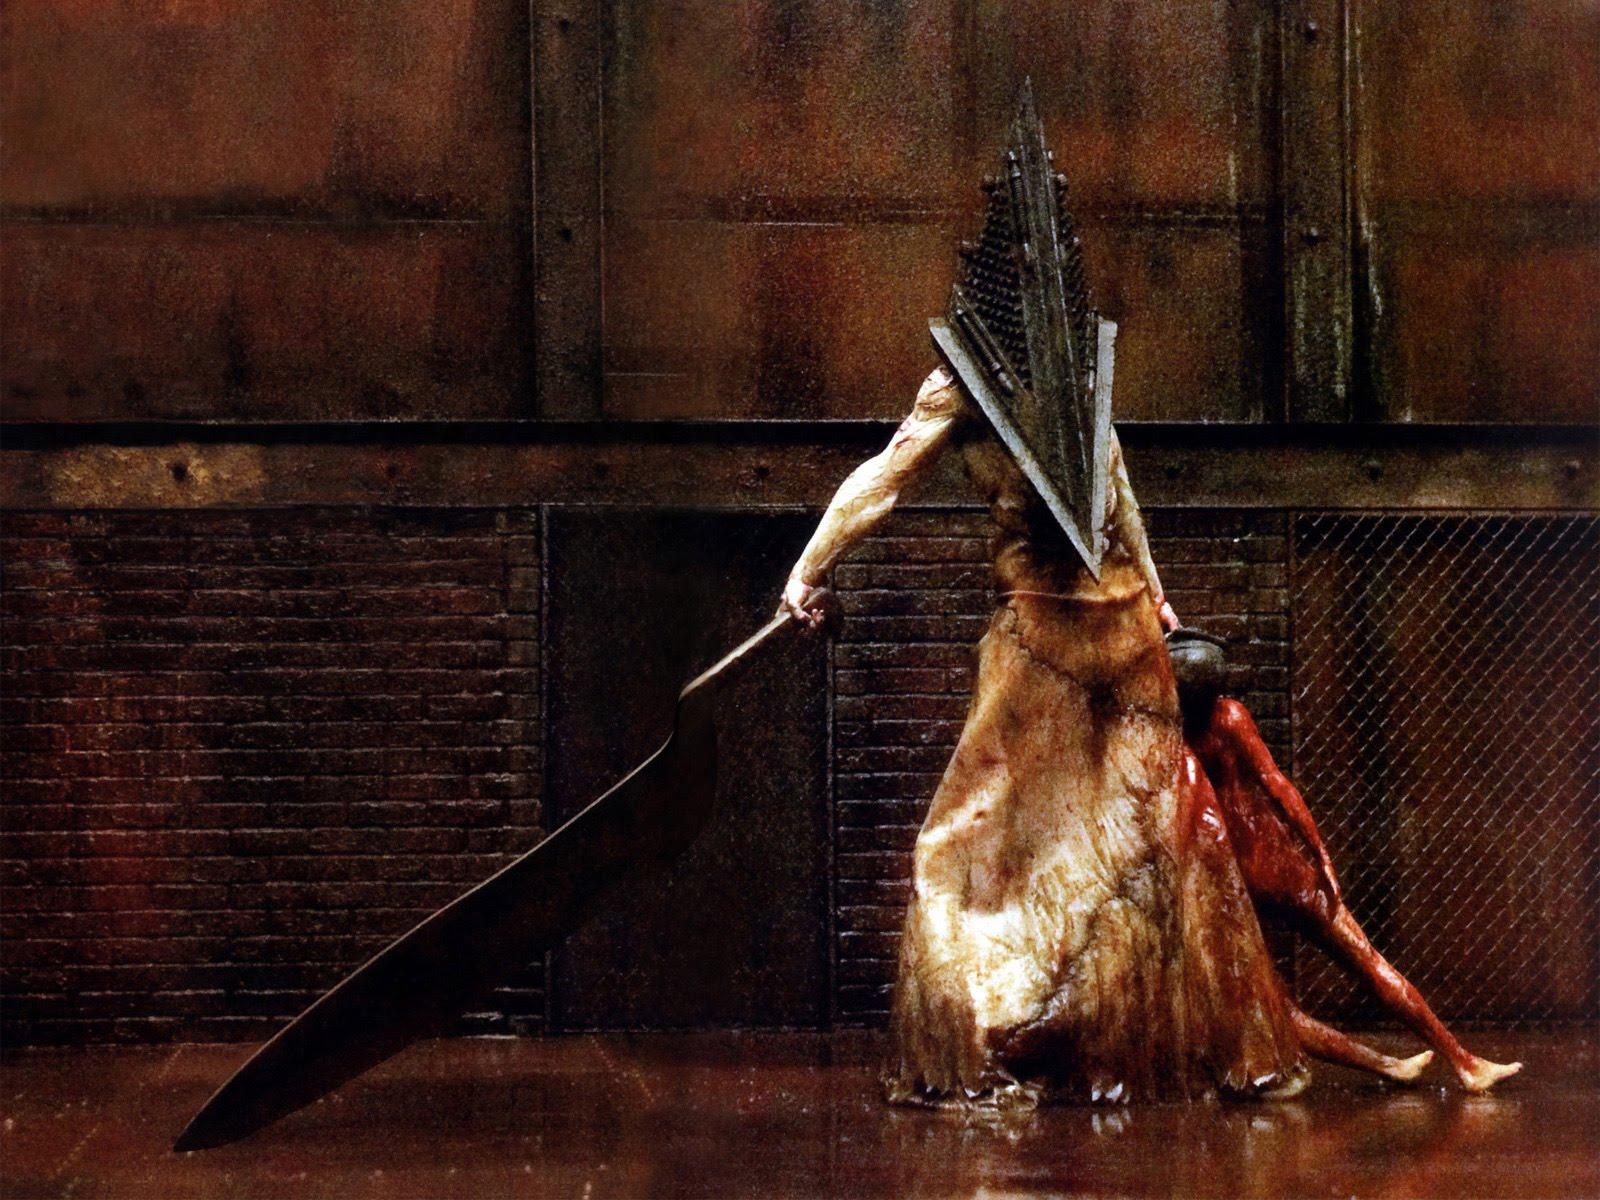 http://4.bp.blogspot.com/_me1_MfBXb50/TROacnMIJSI/AAAAAAAAAIo/aCBpt9x3FU8/s1600/silent_hill_wallpaper_pyramid_head.jpg